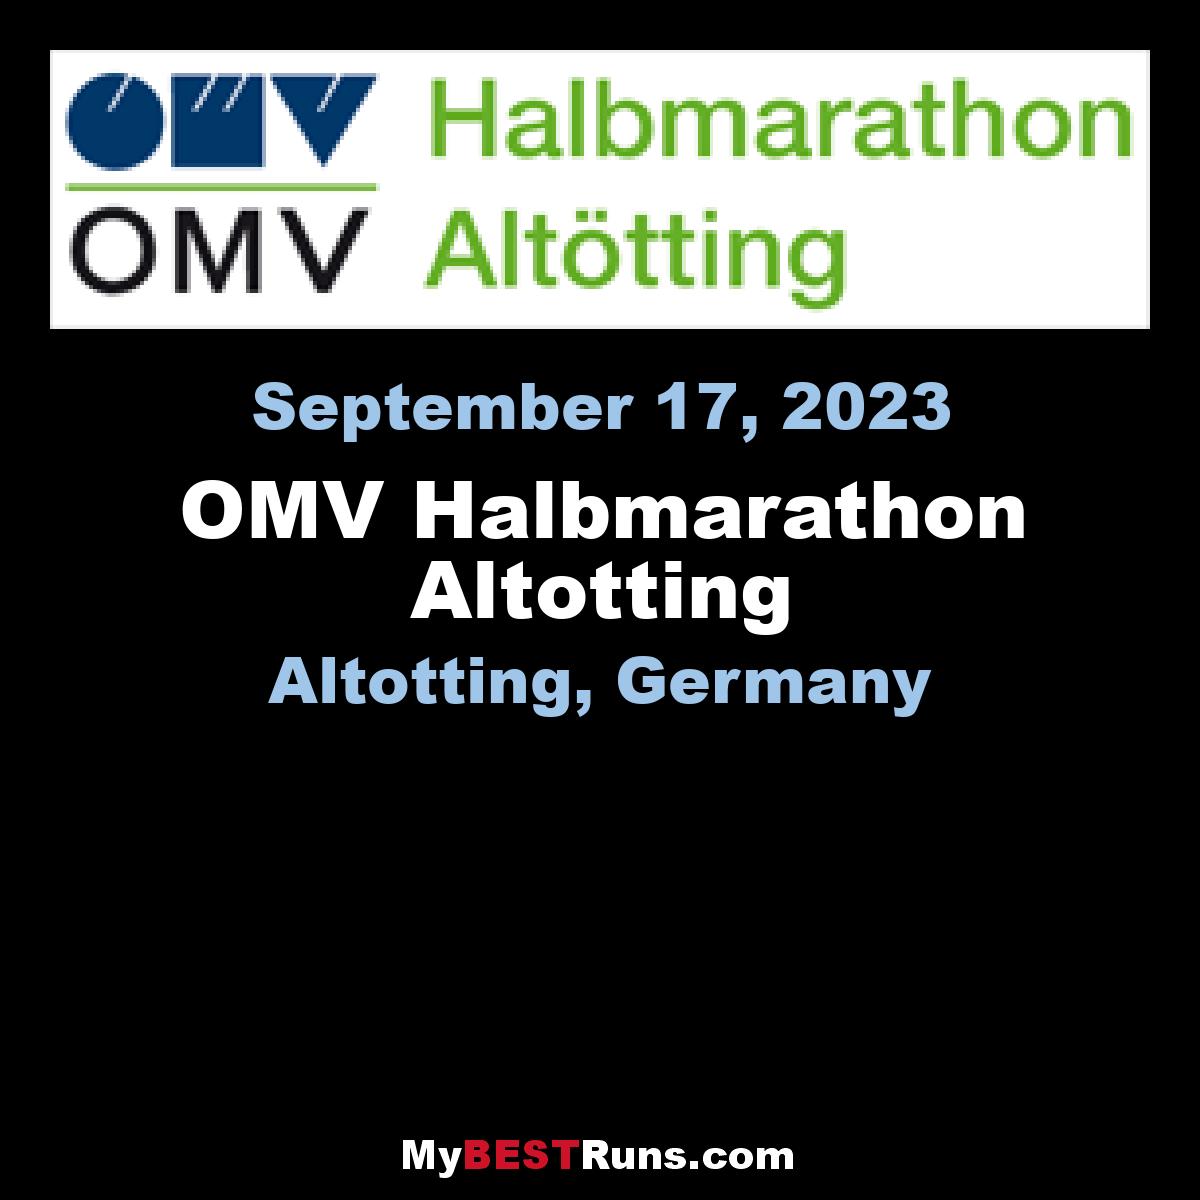 OMV Halbmarathon Altotting